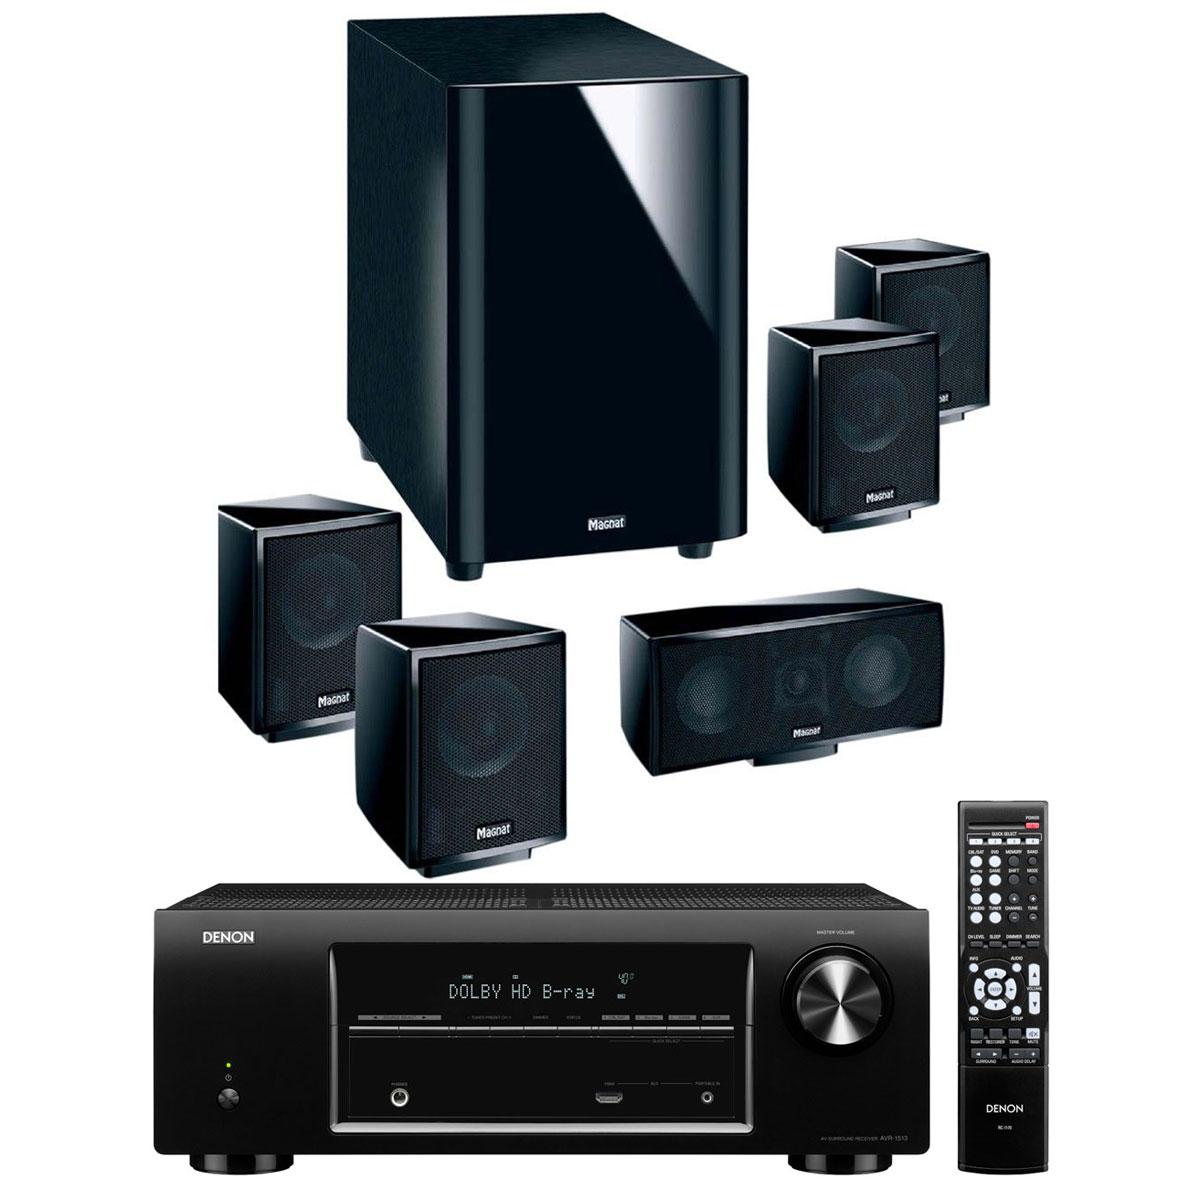 Ensemble home cinéma Denon AVR-1513 Noir + Magnat Interior 5001 A Ampli-tuner Home Cinéma 5.1 3D Ready avec HDMI en façade + Pack d'enceintes 5.1